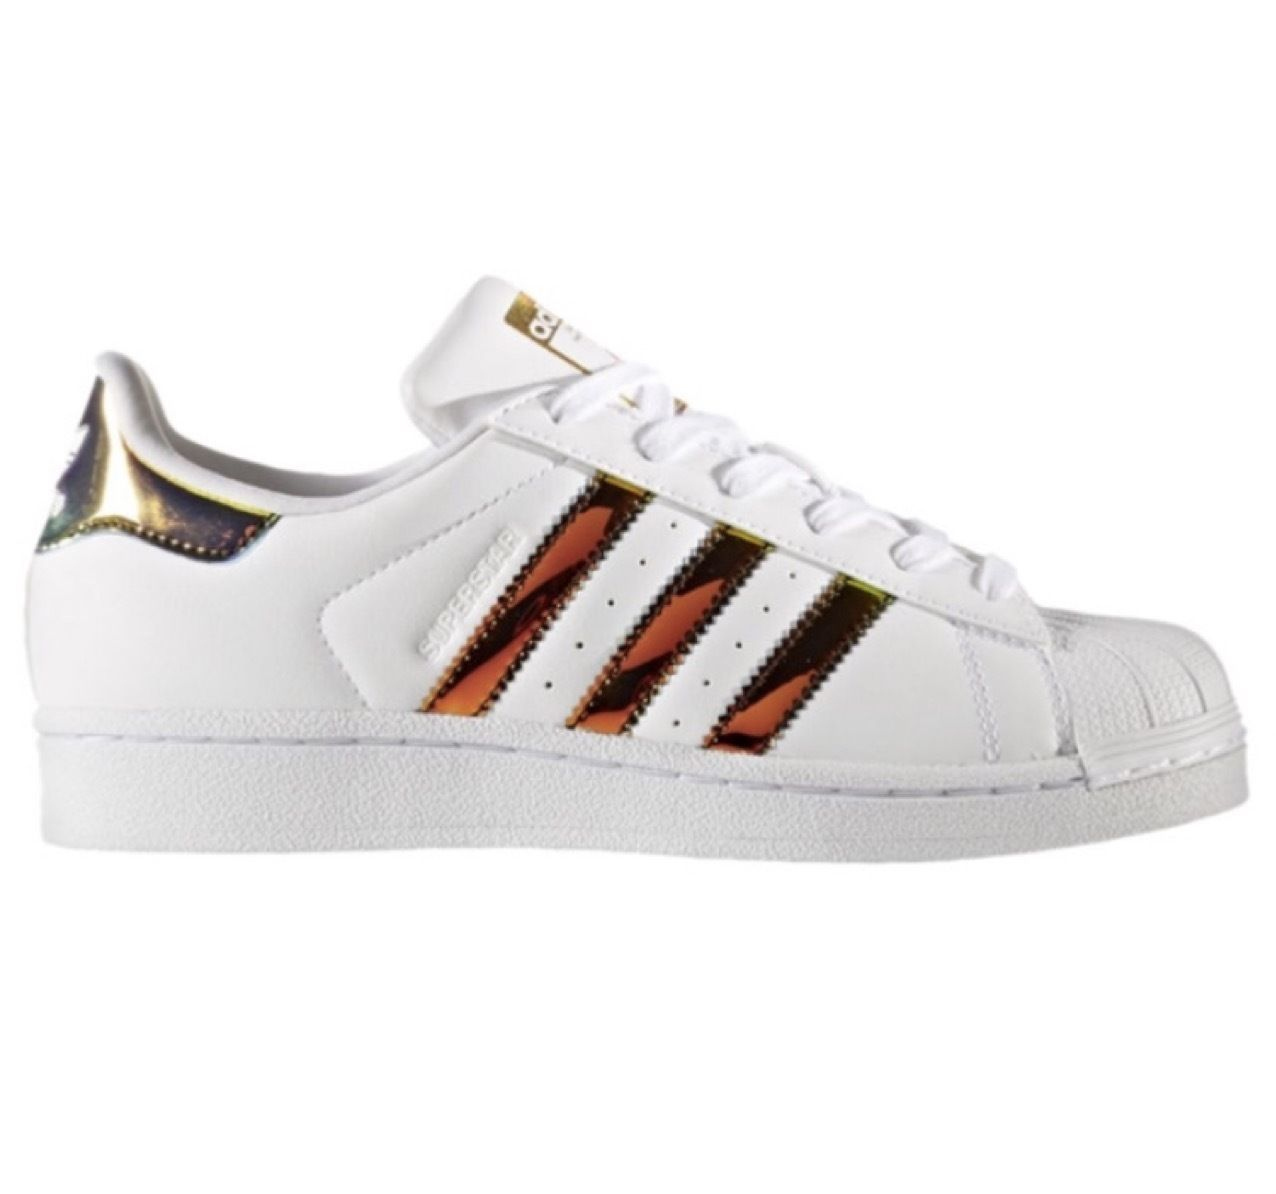 Adidas Superstar White Gold Green